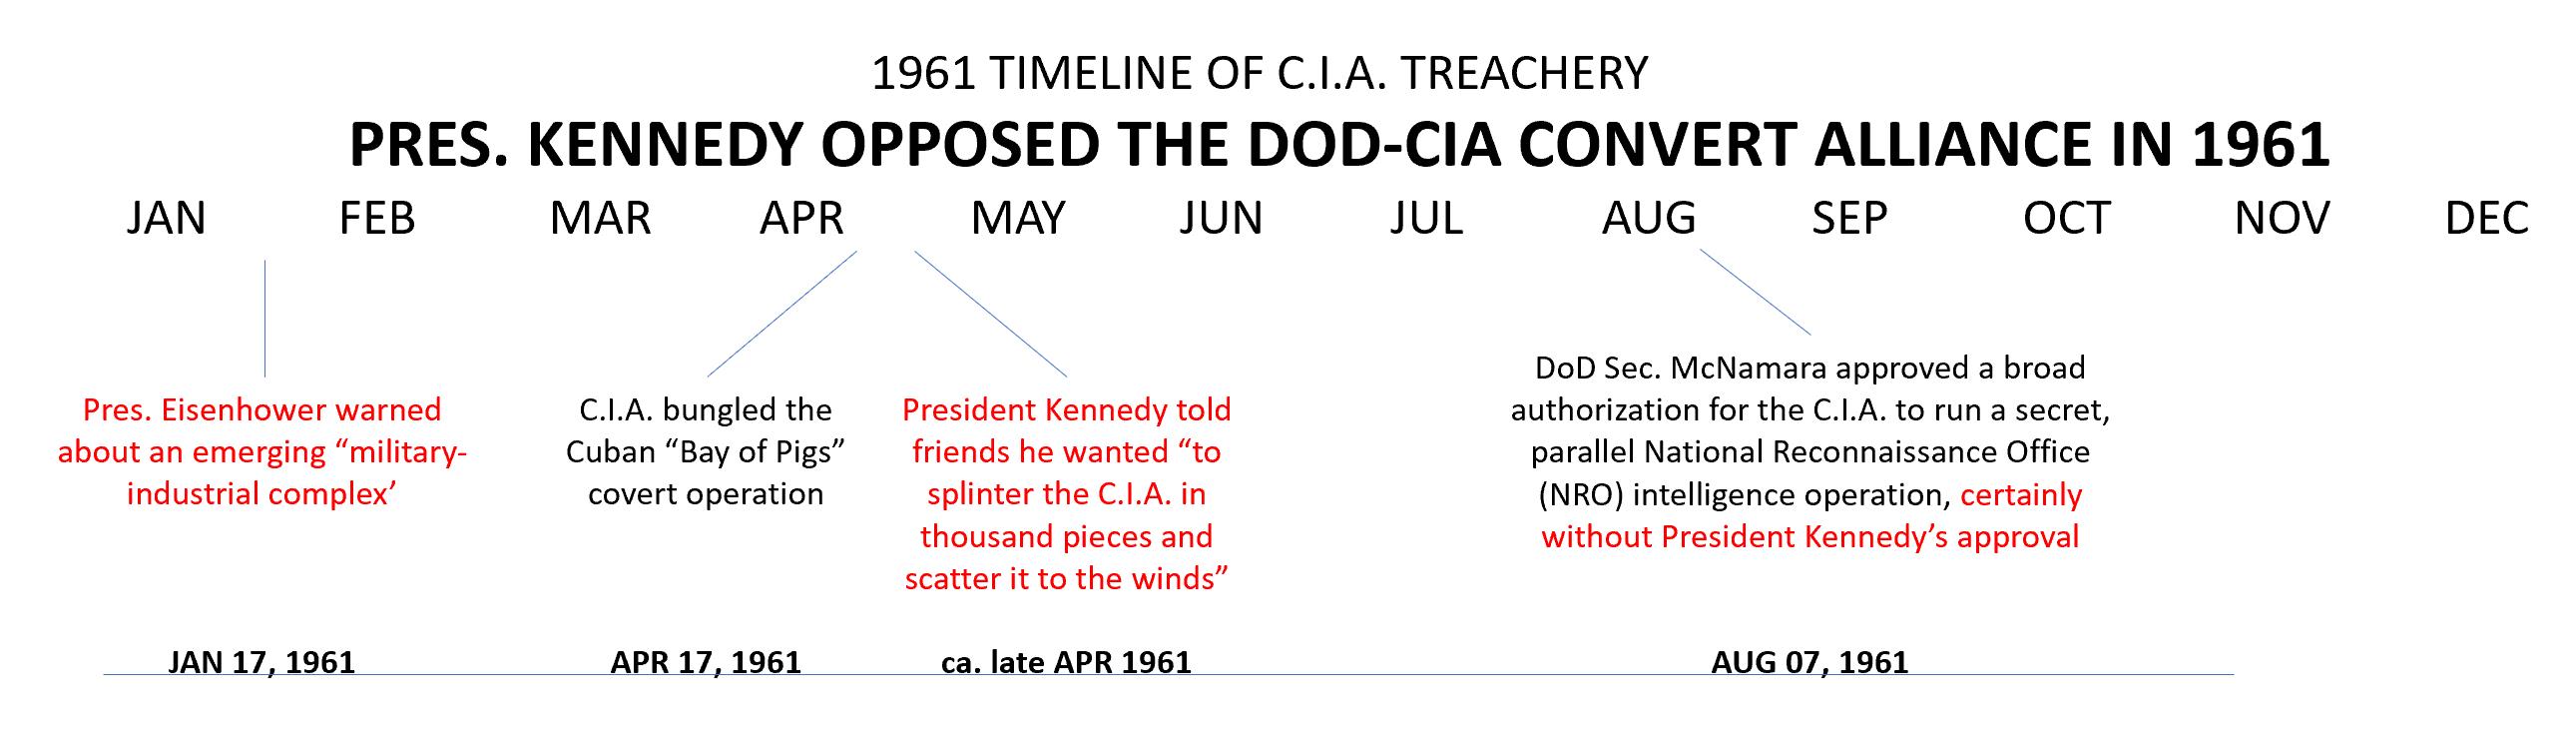 1963 Timeline of Dulles-McNamara-CIA treachery